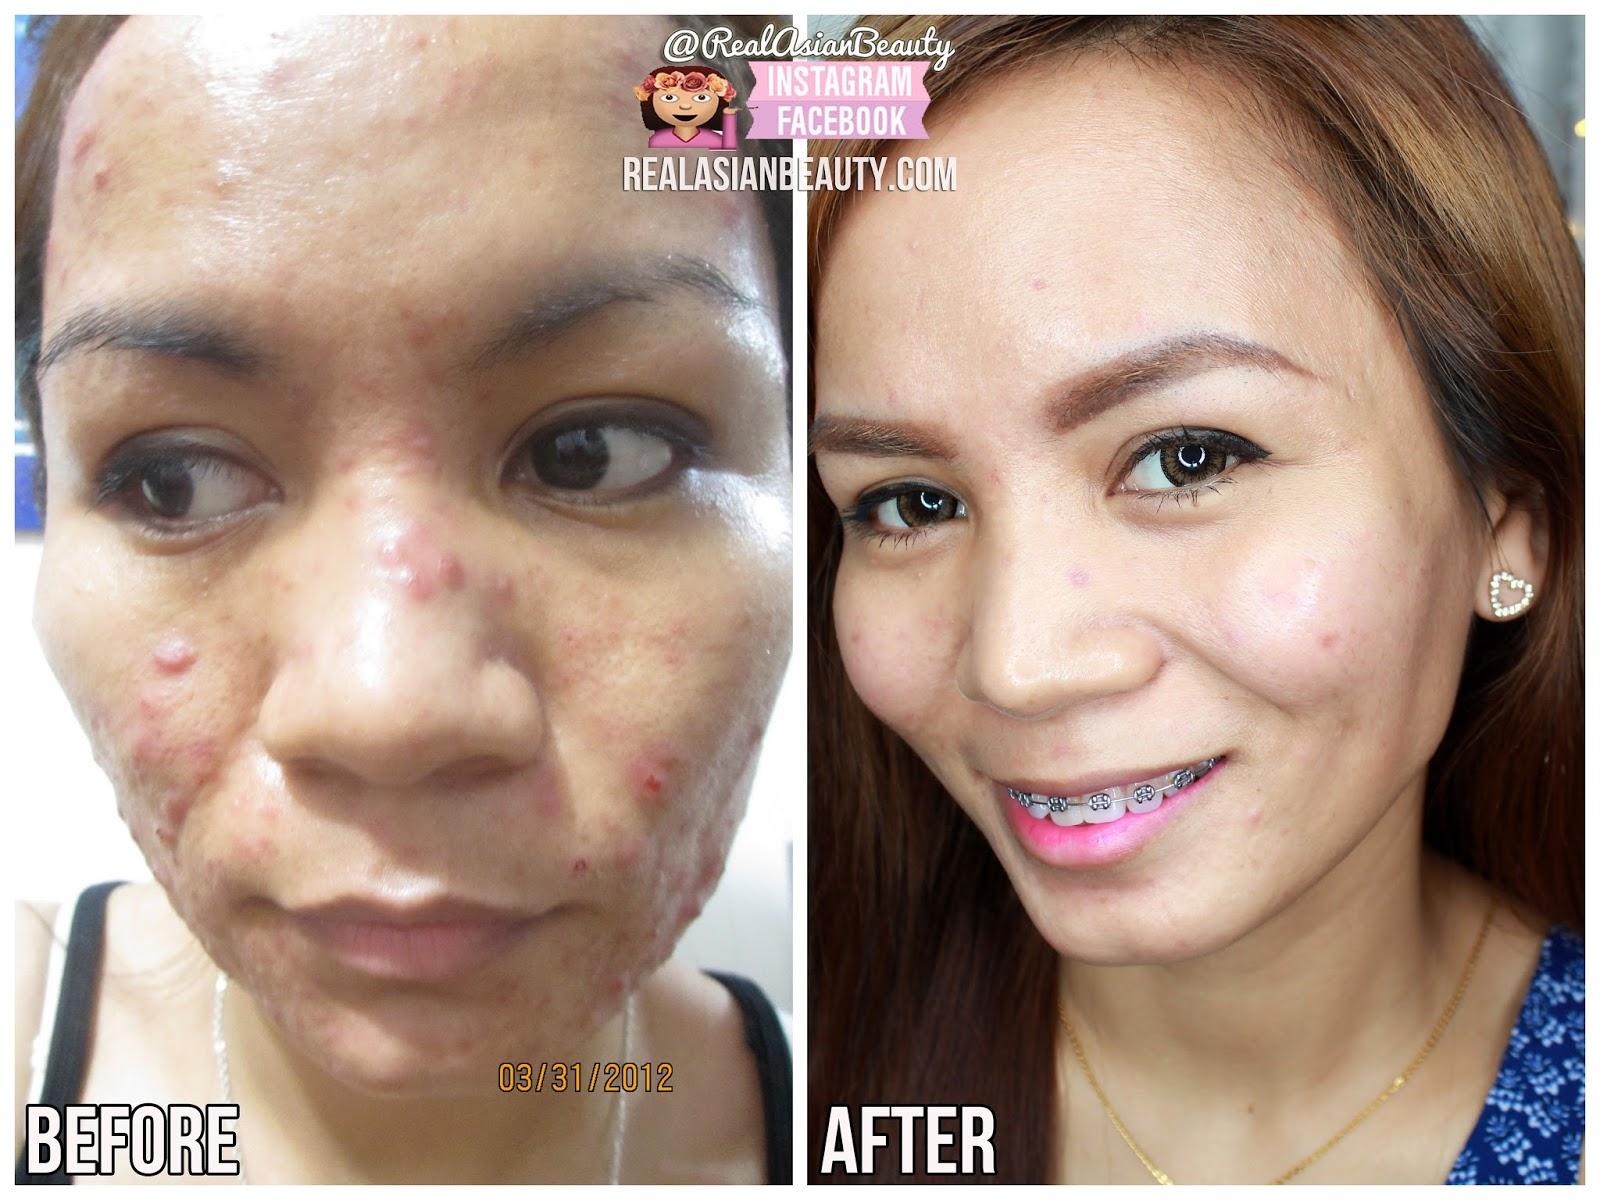 Real Asian Beauty: ESKINOL and DALACIN-C (PROS and CONS of